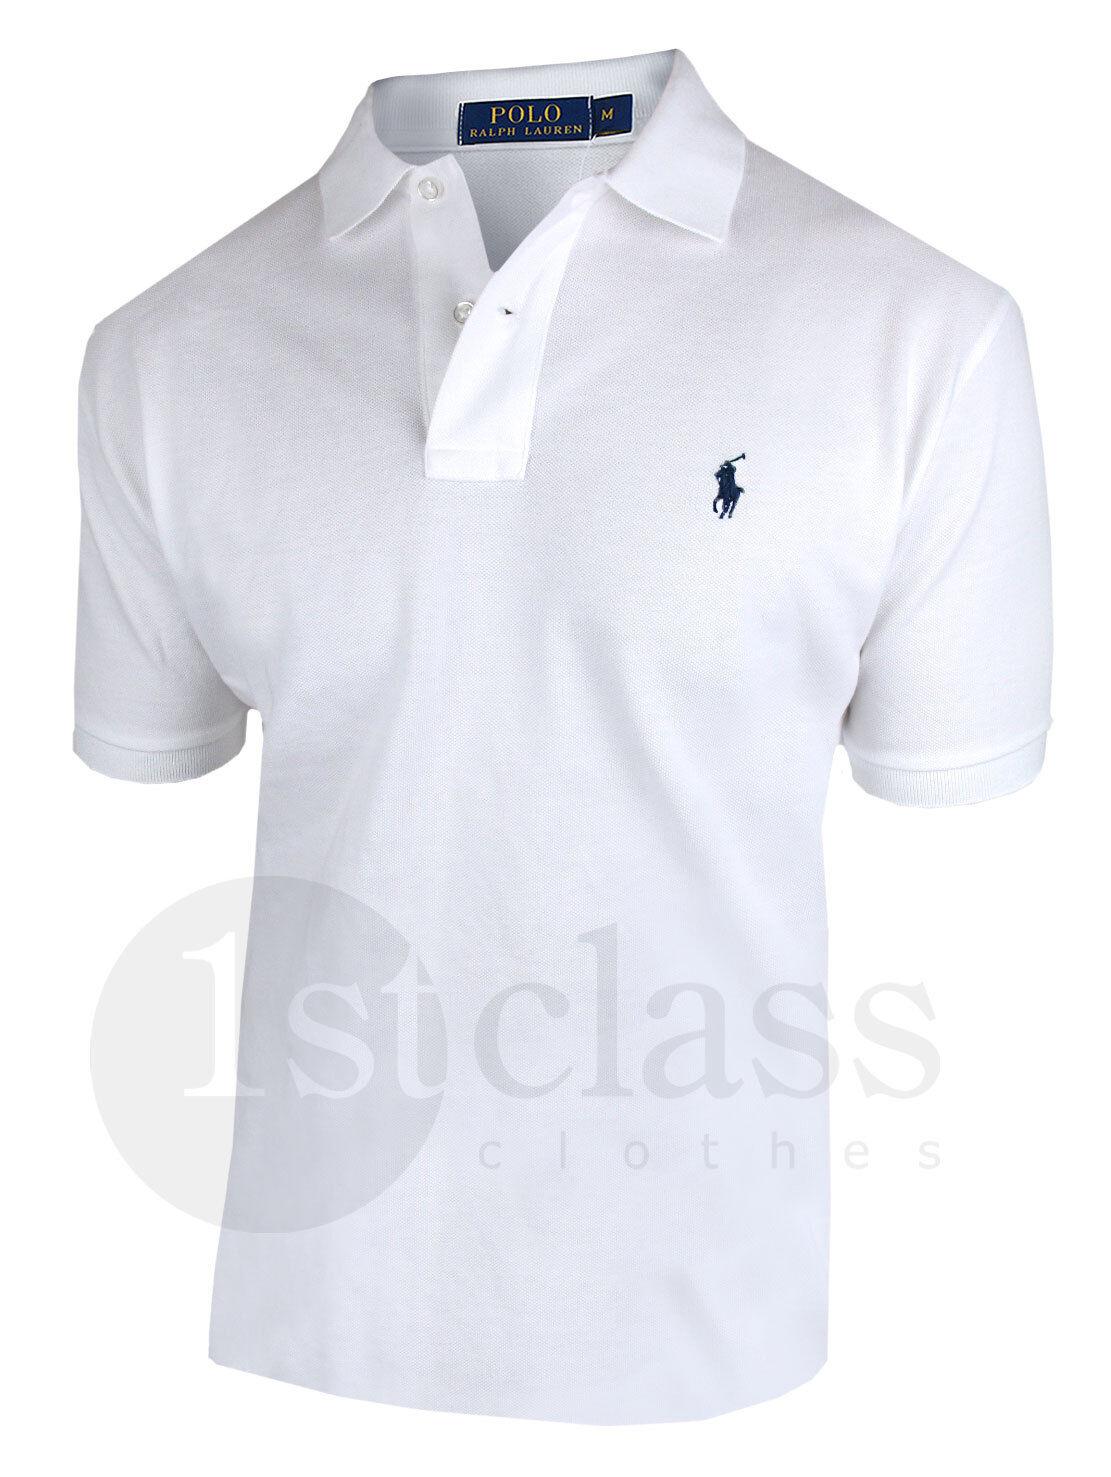 Polo RALPH LAUREN Poloshirt CLASSIC FIT Farbwahl 100% Baumwolle das Original